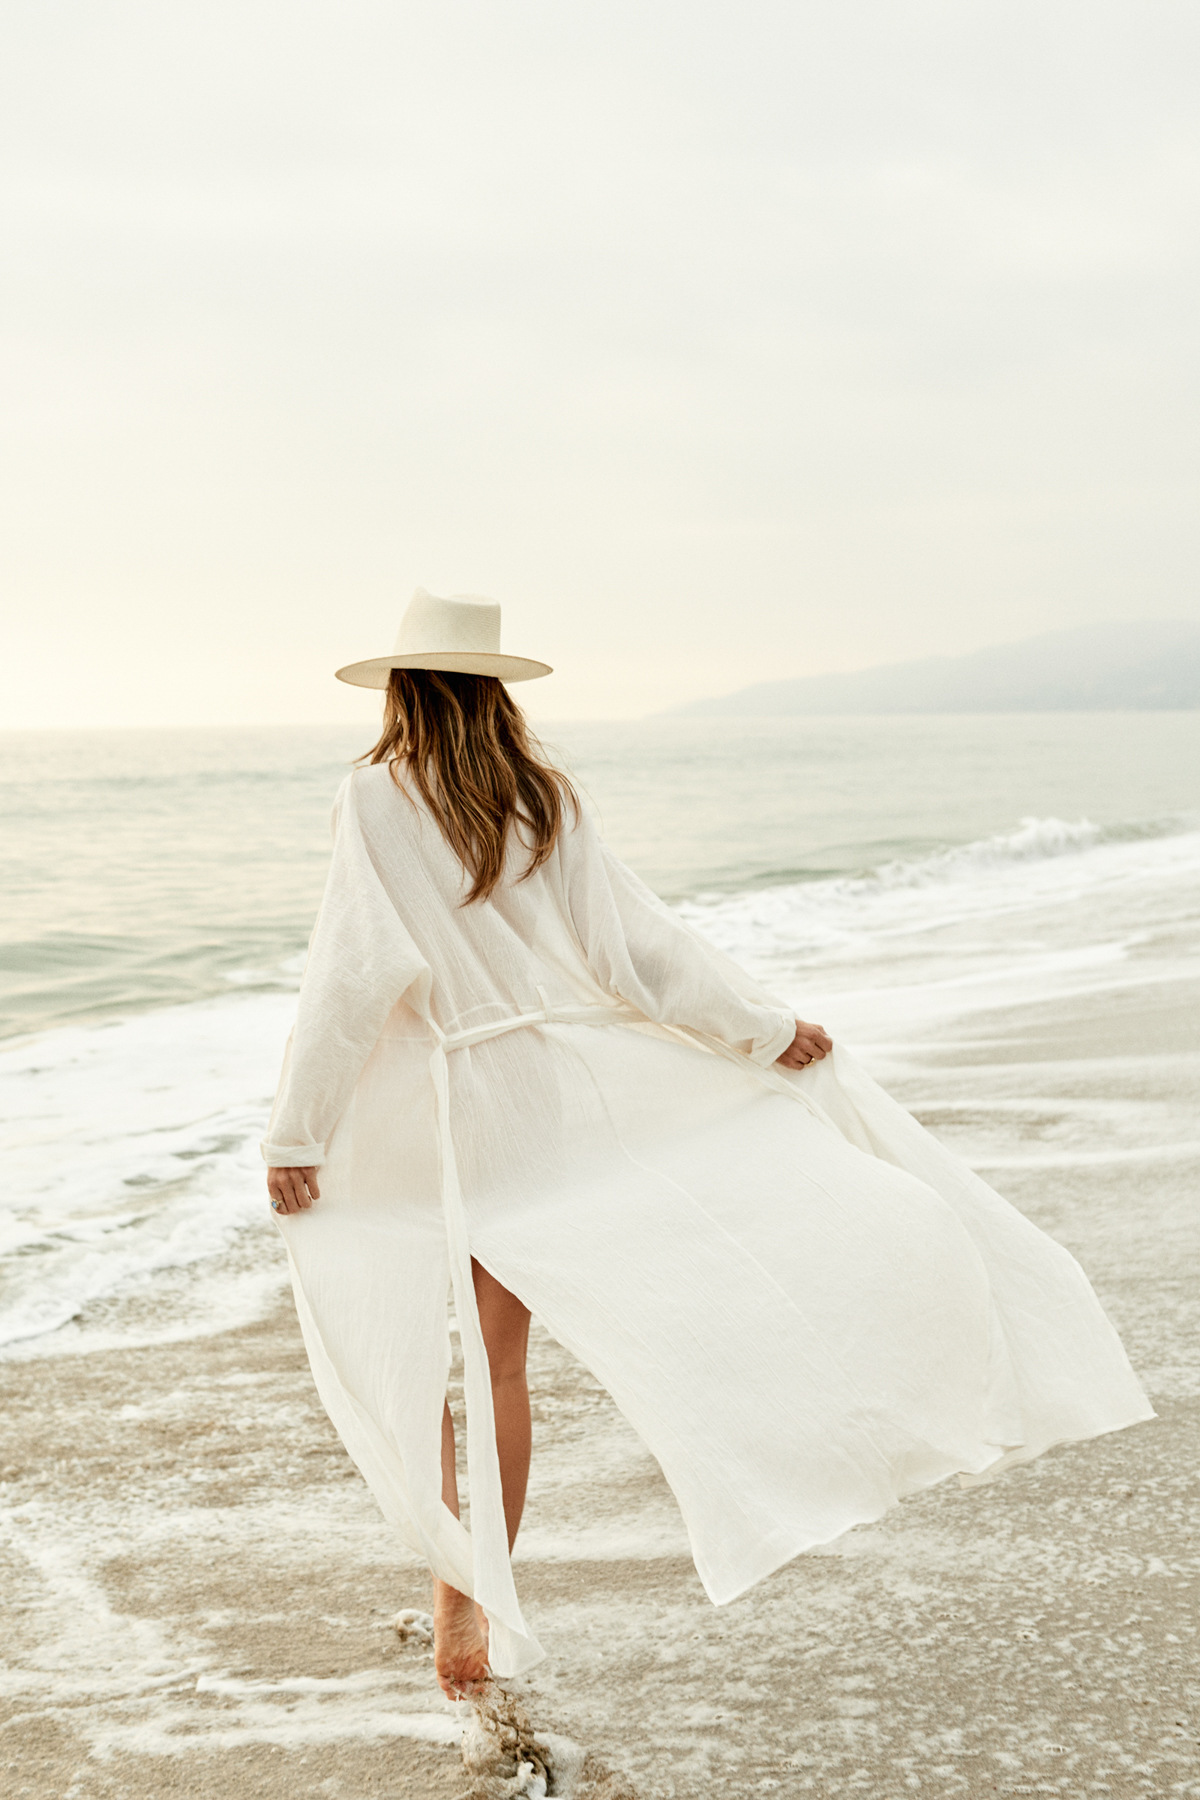 2bee7b5d8bd Maxi Dresses For Women Beach Wear Dresses Summer 2019 White Dress Long  Sleeve Boho Clothing Ladies Belt Saida De Praia Frocks